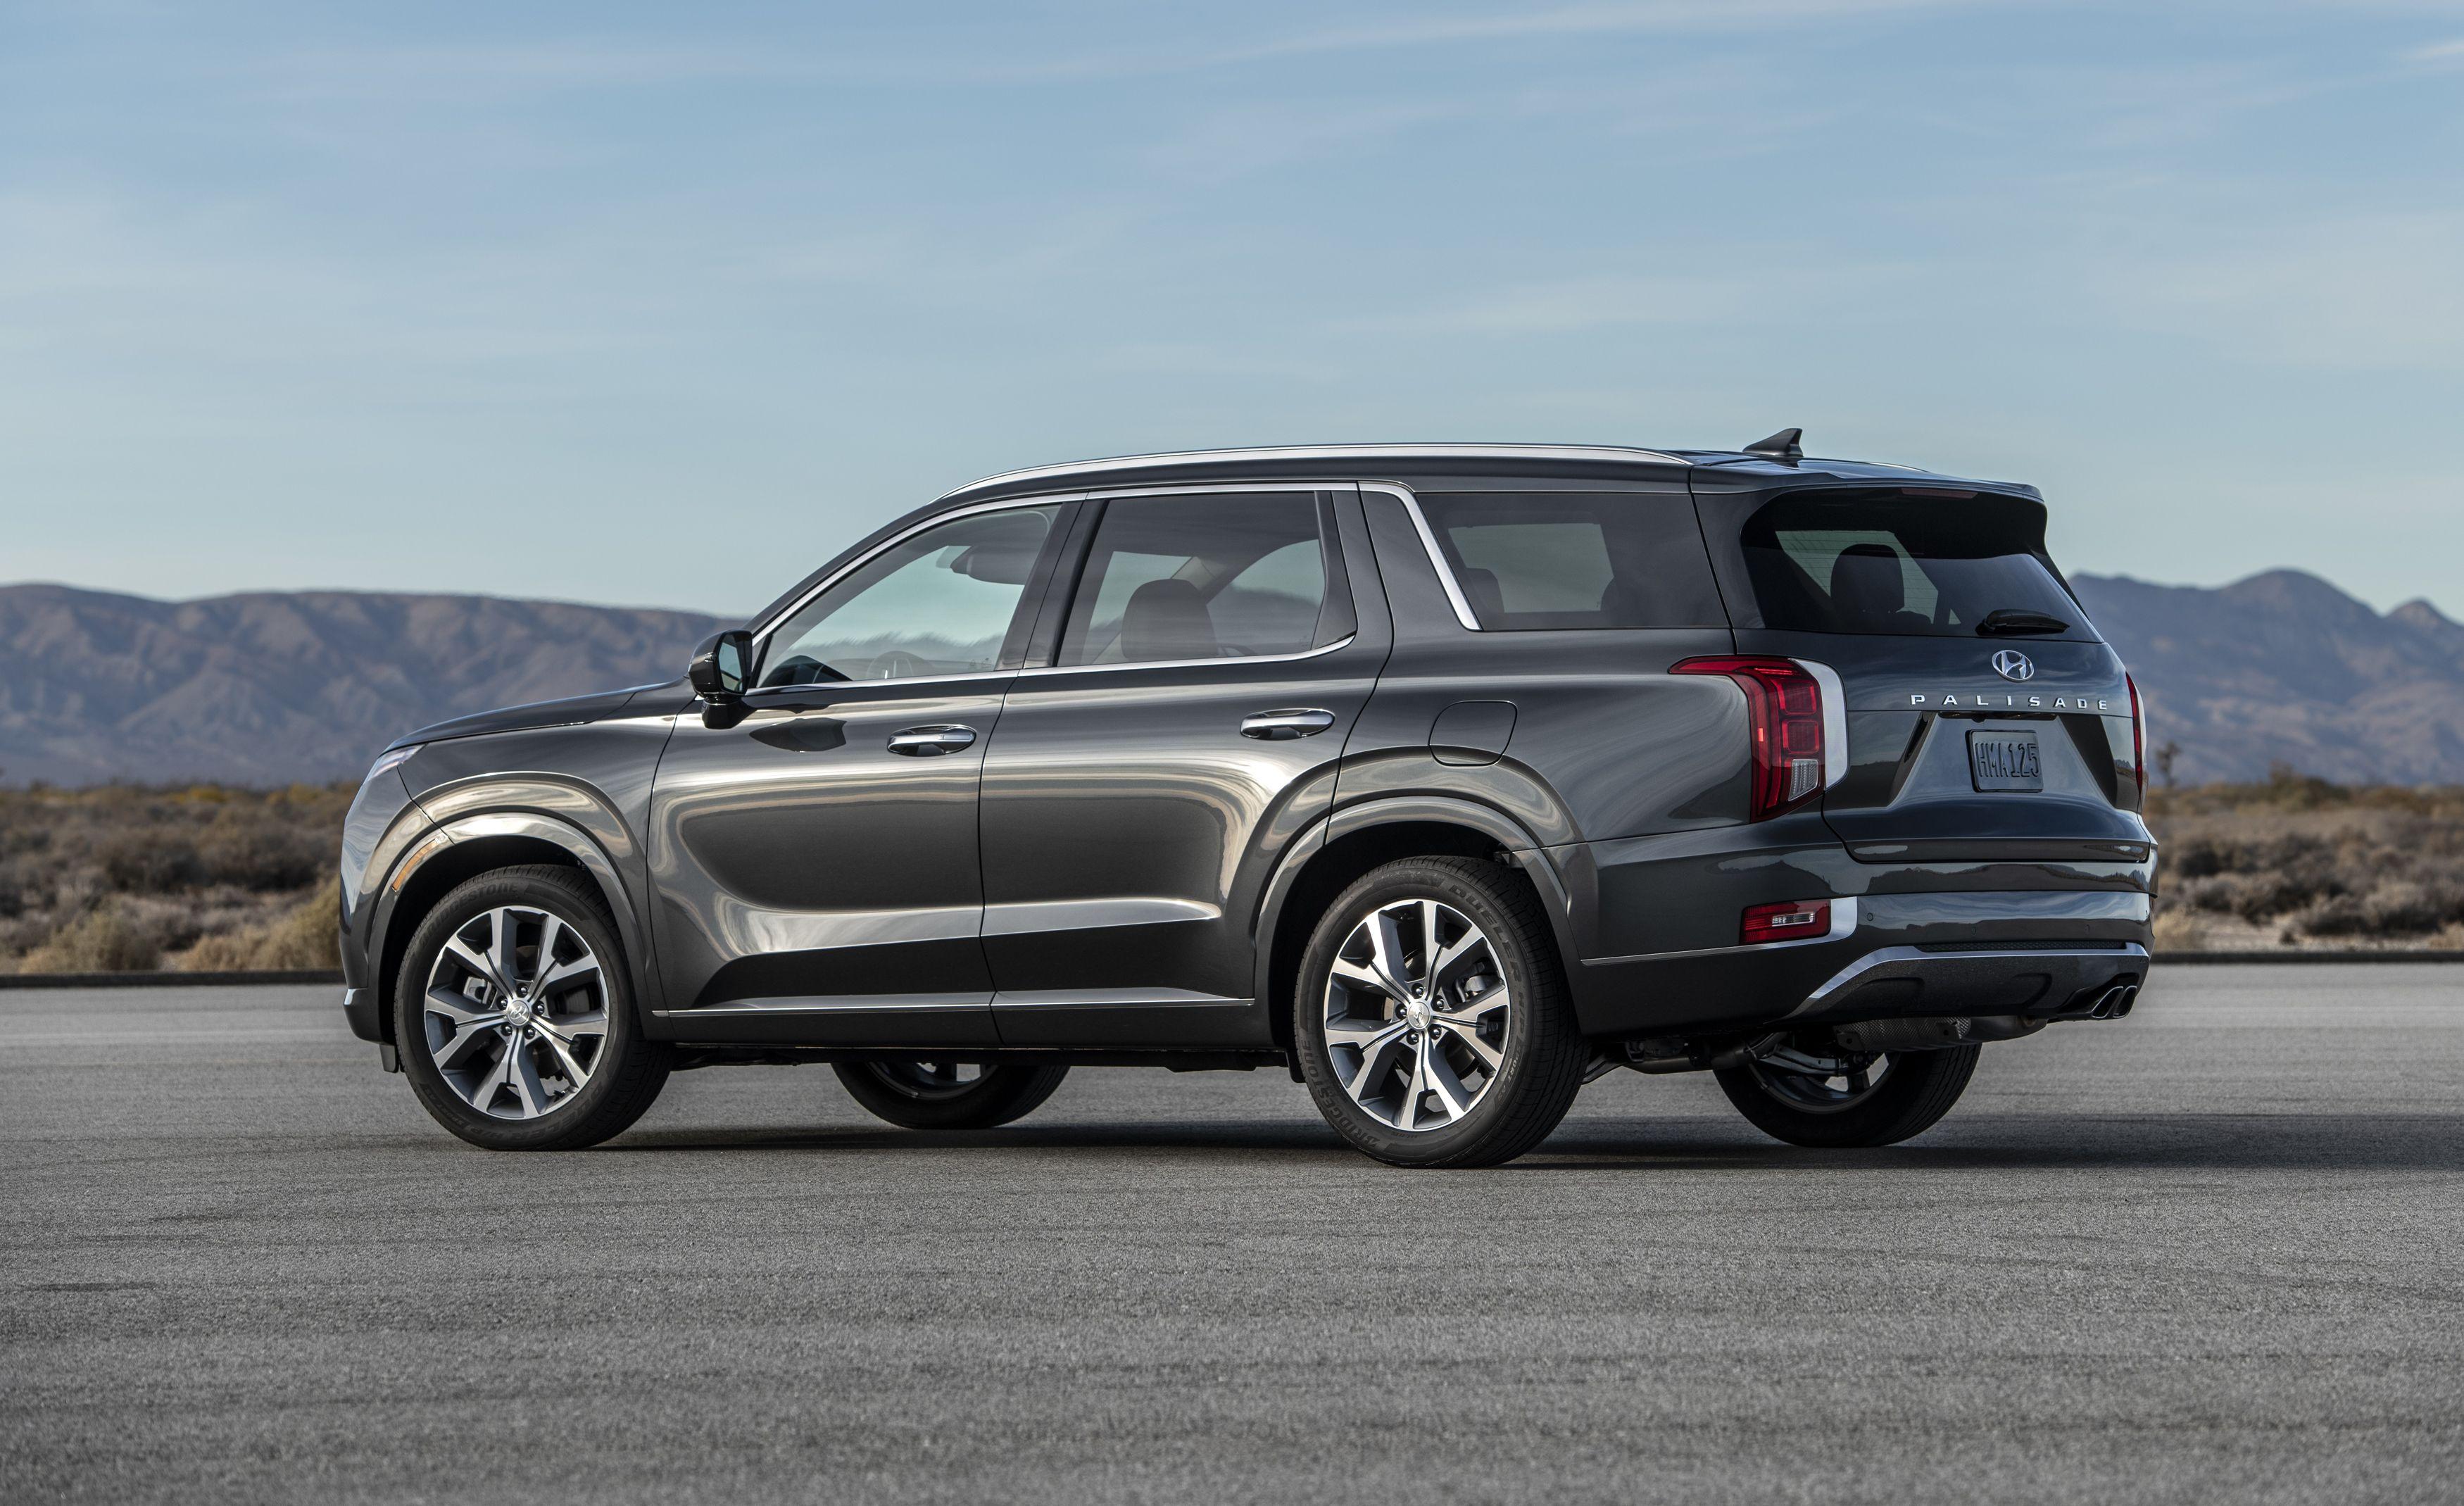 The 2020 Hyundai Palisade Is A Properly Three Row Suv